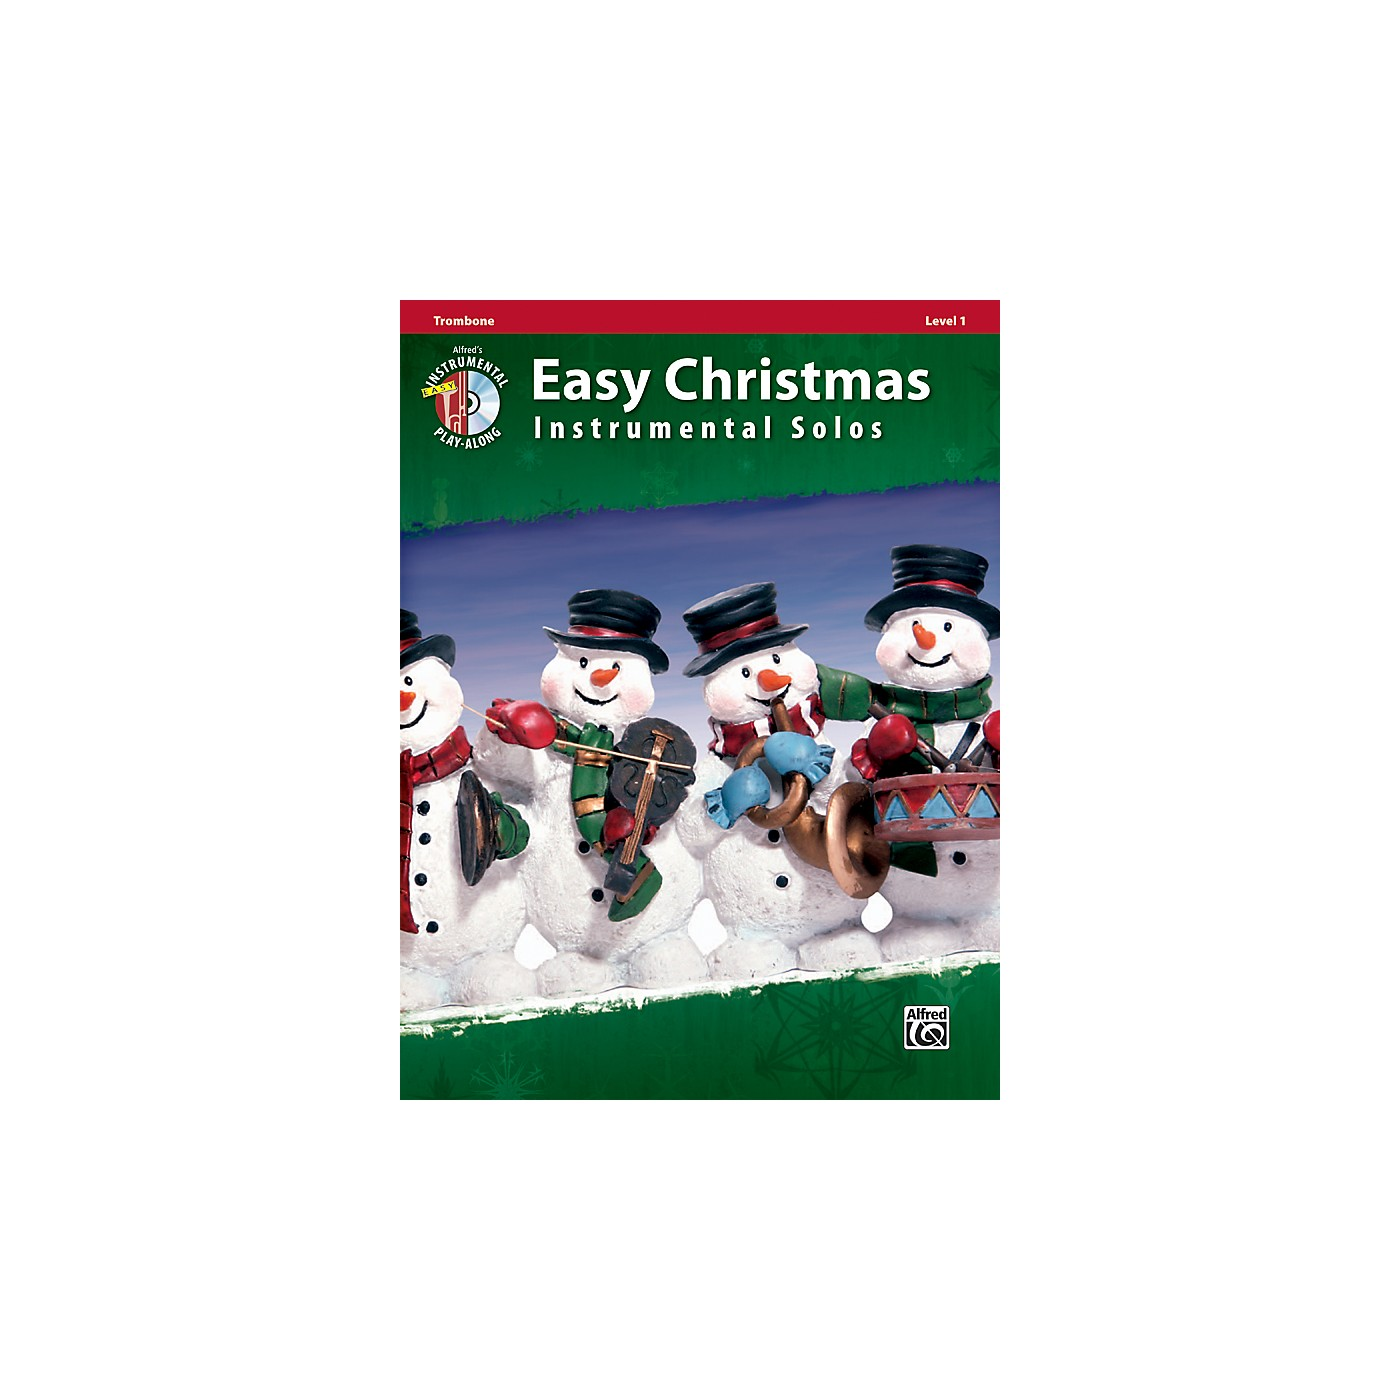 Alfred Easy Christmas Instrumental Solos Level 1 Trombone Book & CD thumbnail